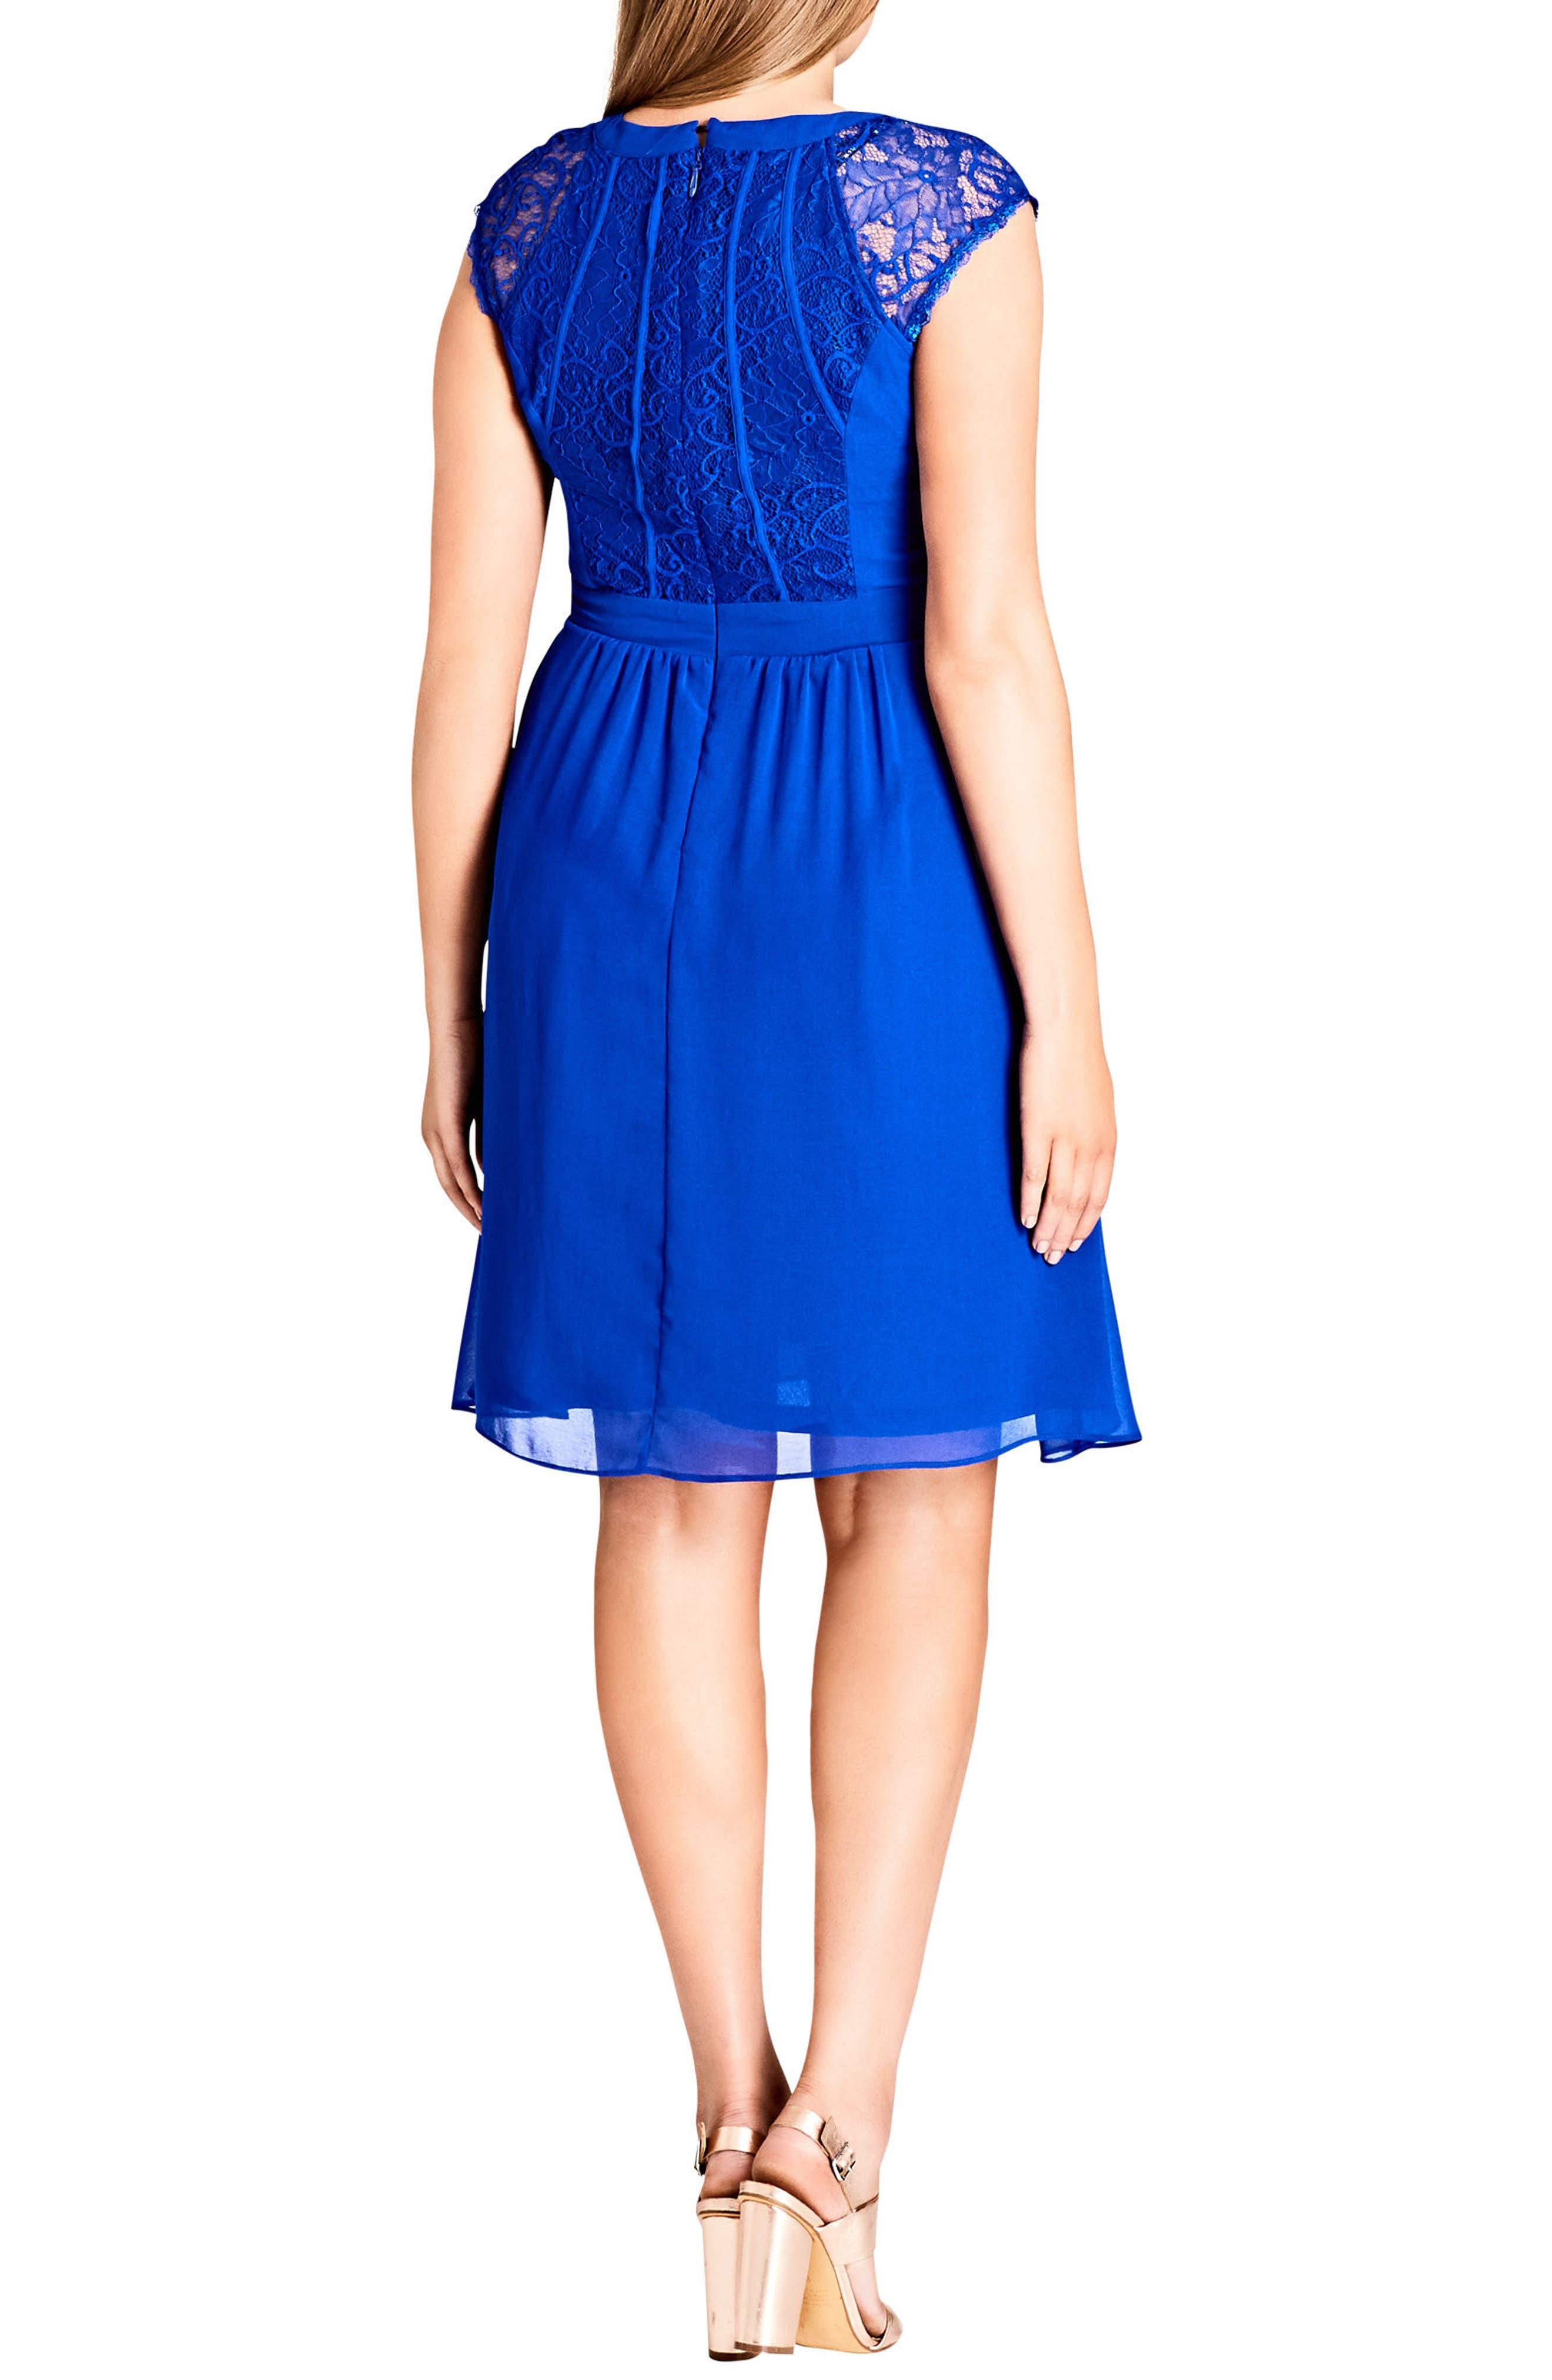 Alternate Image 2  - City Chic Lace Inset Fit & Flare Dress (Plus Size)